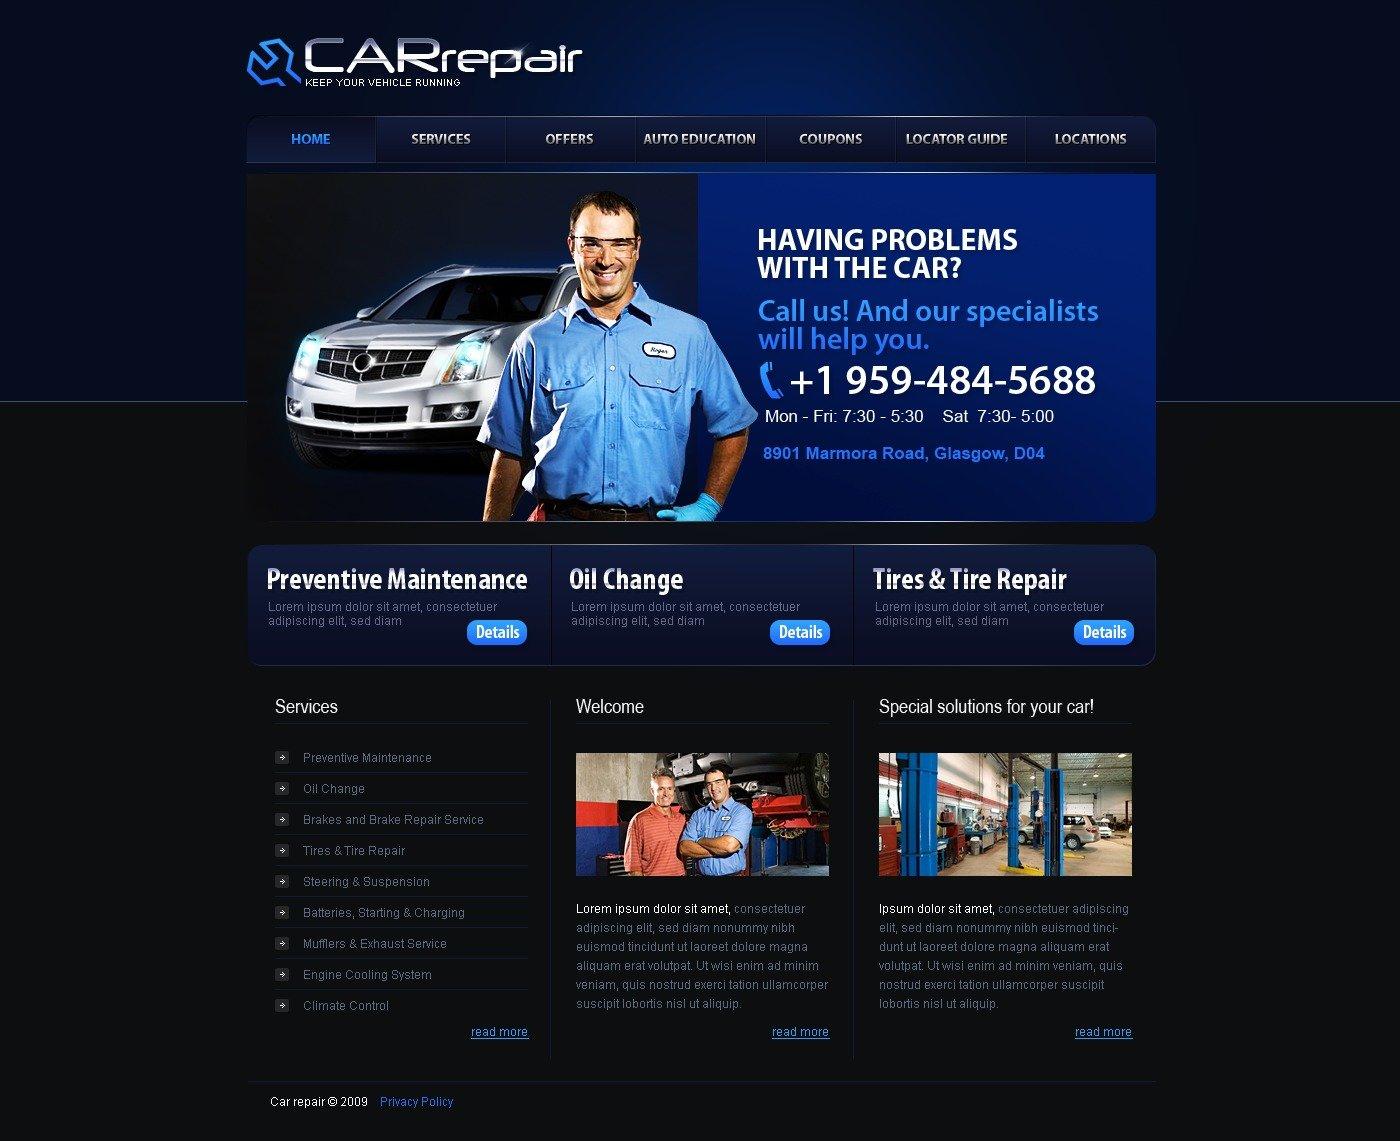 car repair website template 26449. Black Bedroom Furniture Sets. Home Design Ideas